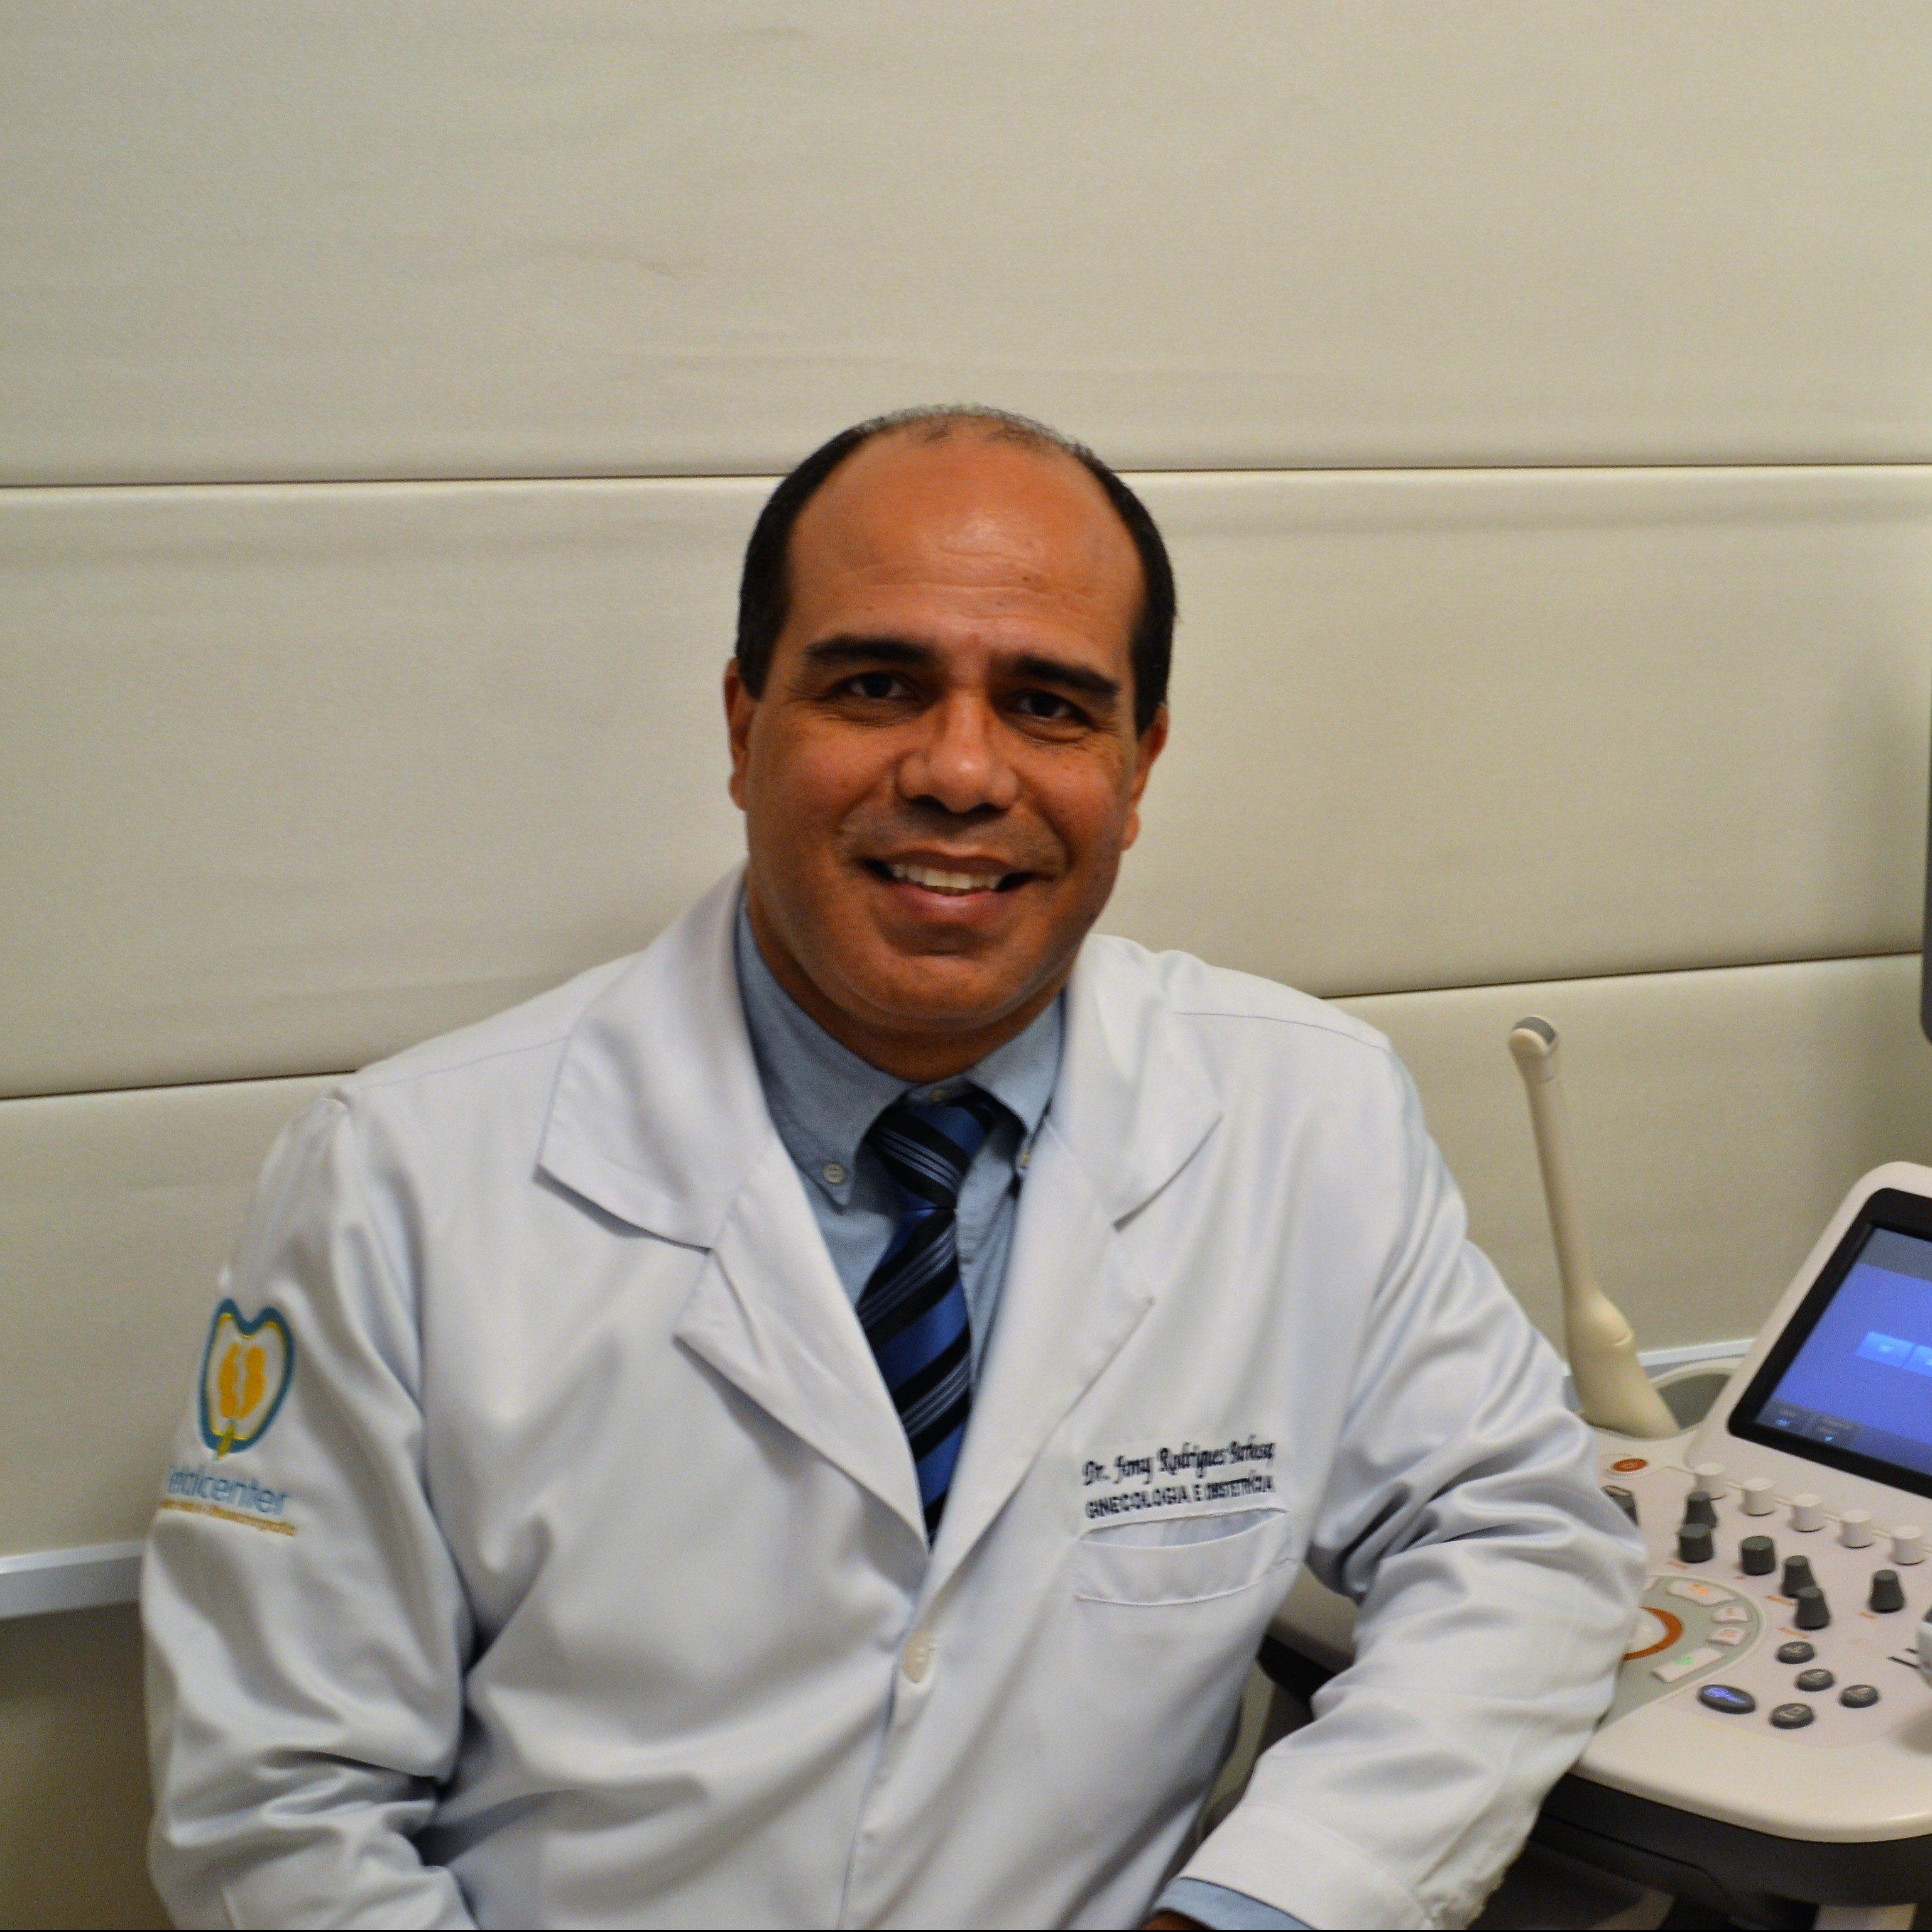 Dr. Jony R. Barbosa CRM 7652